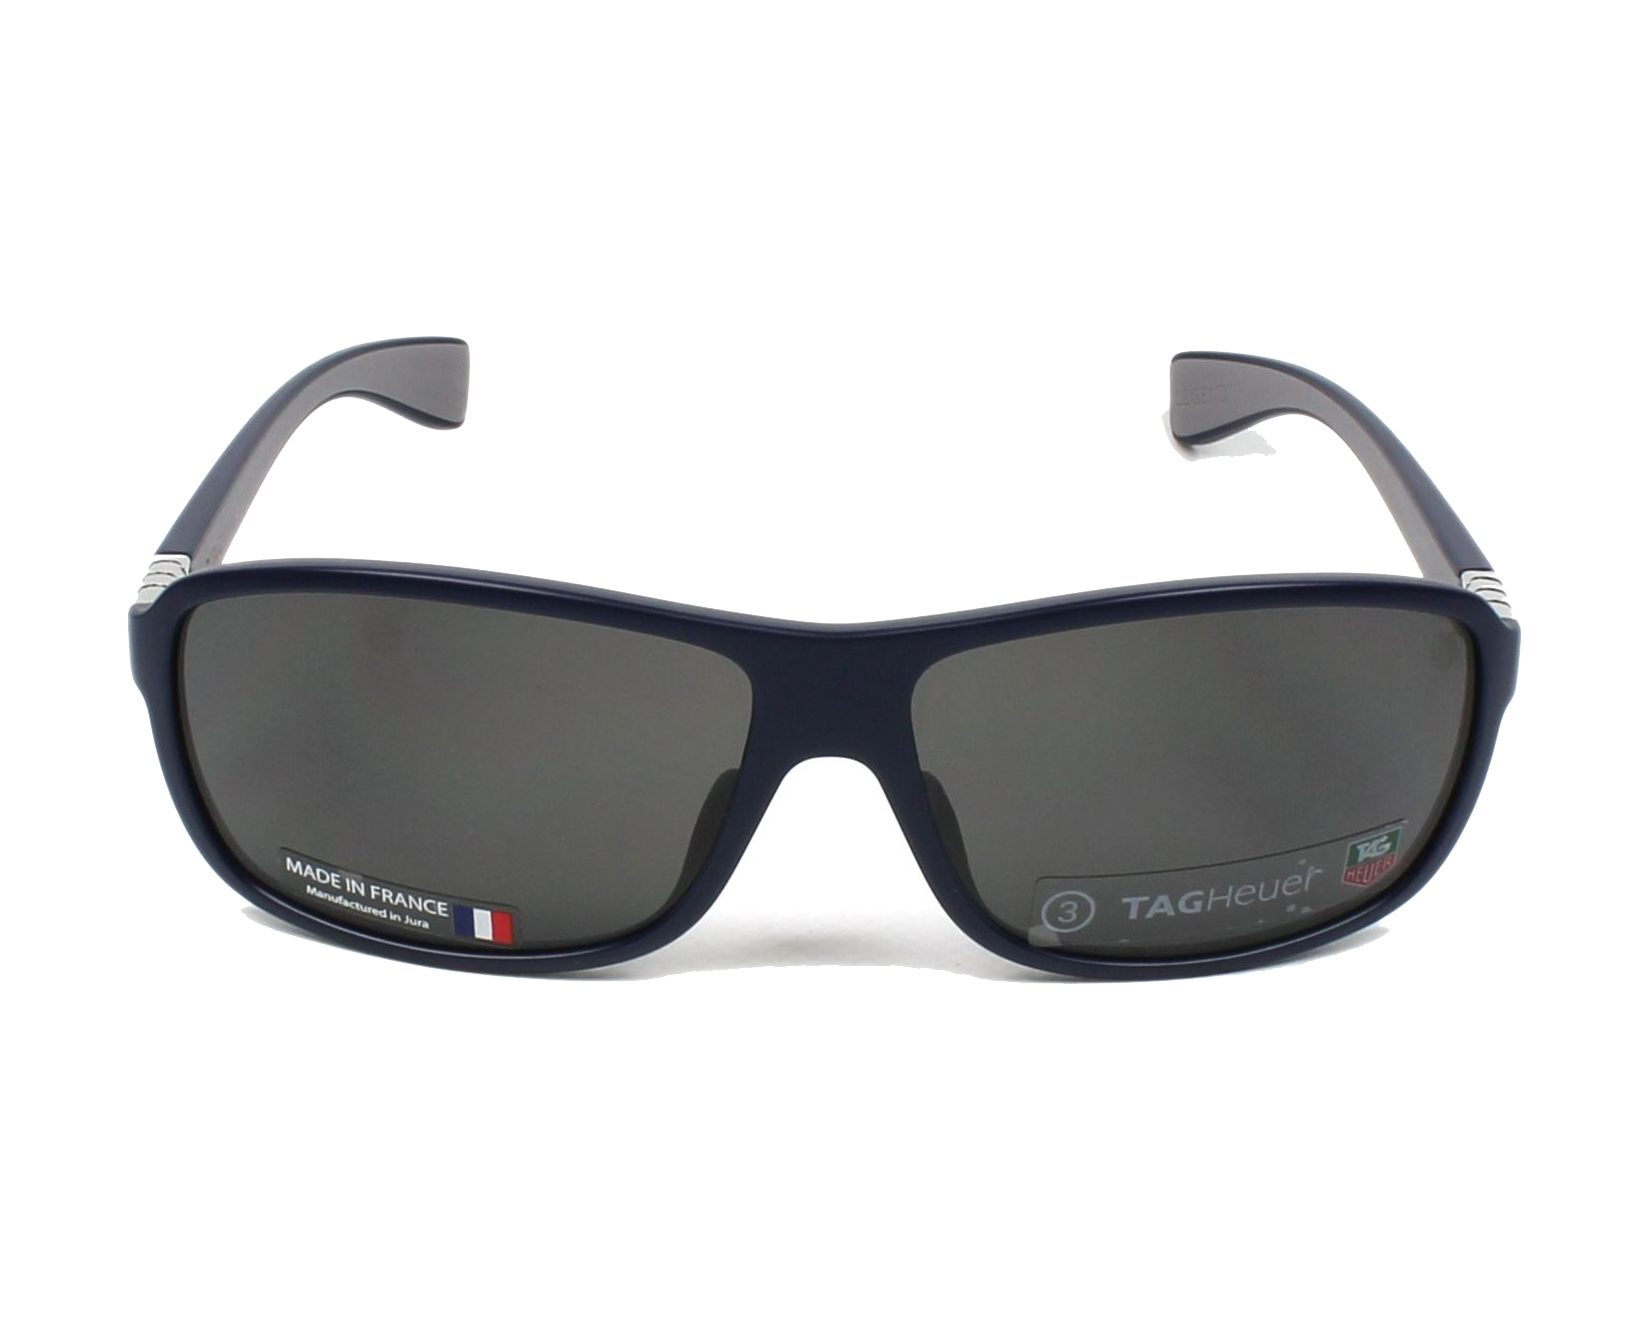 lunettes de soleil legend de tag heuer en th 9302 104. Black Bedroom Furniture Sets. Home Design Ideas